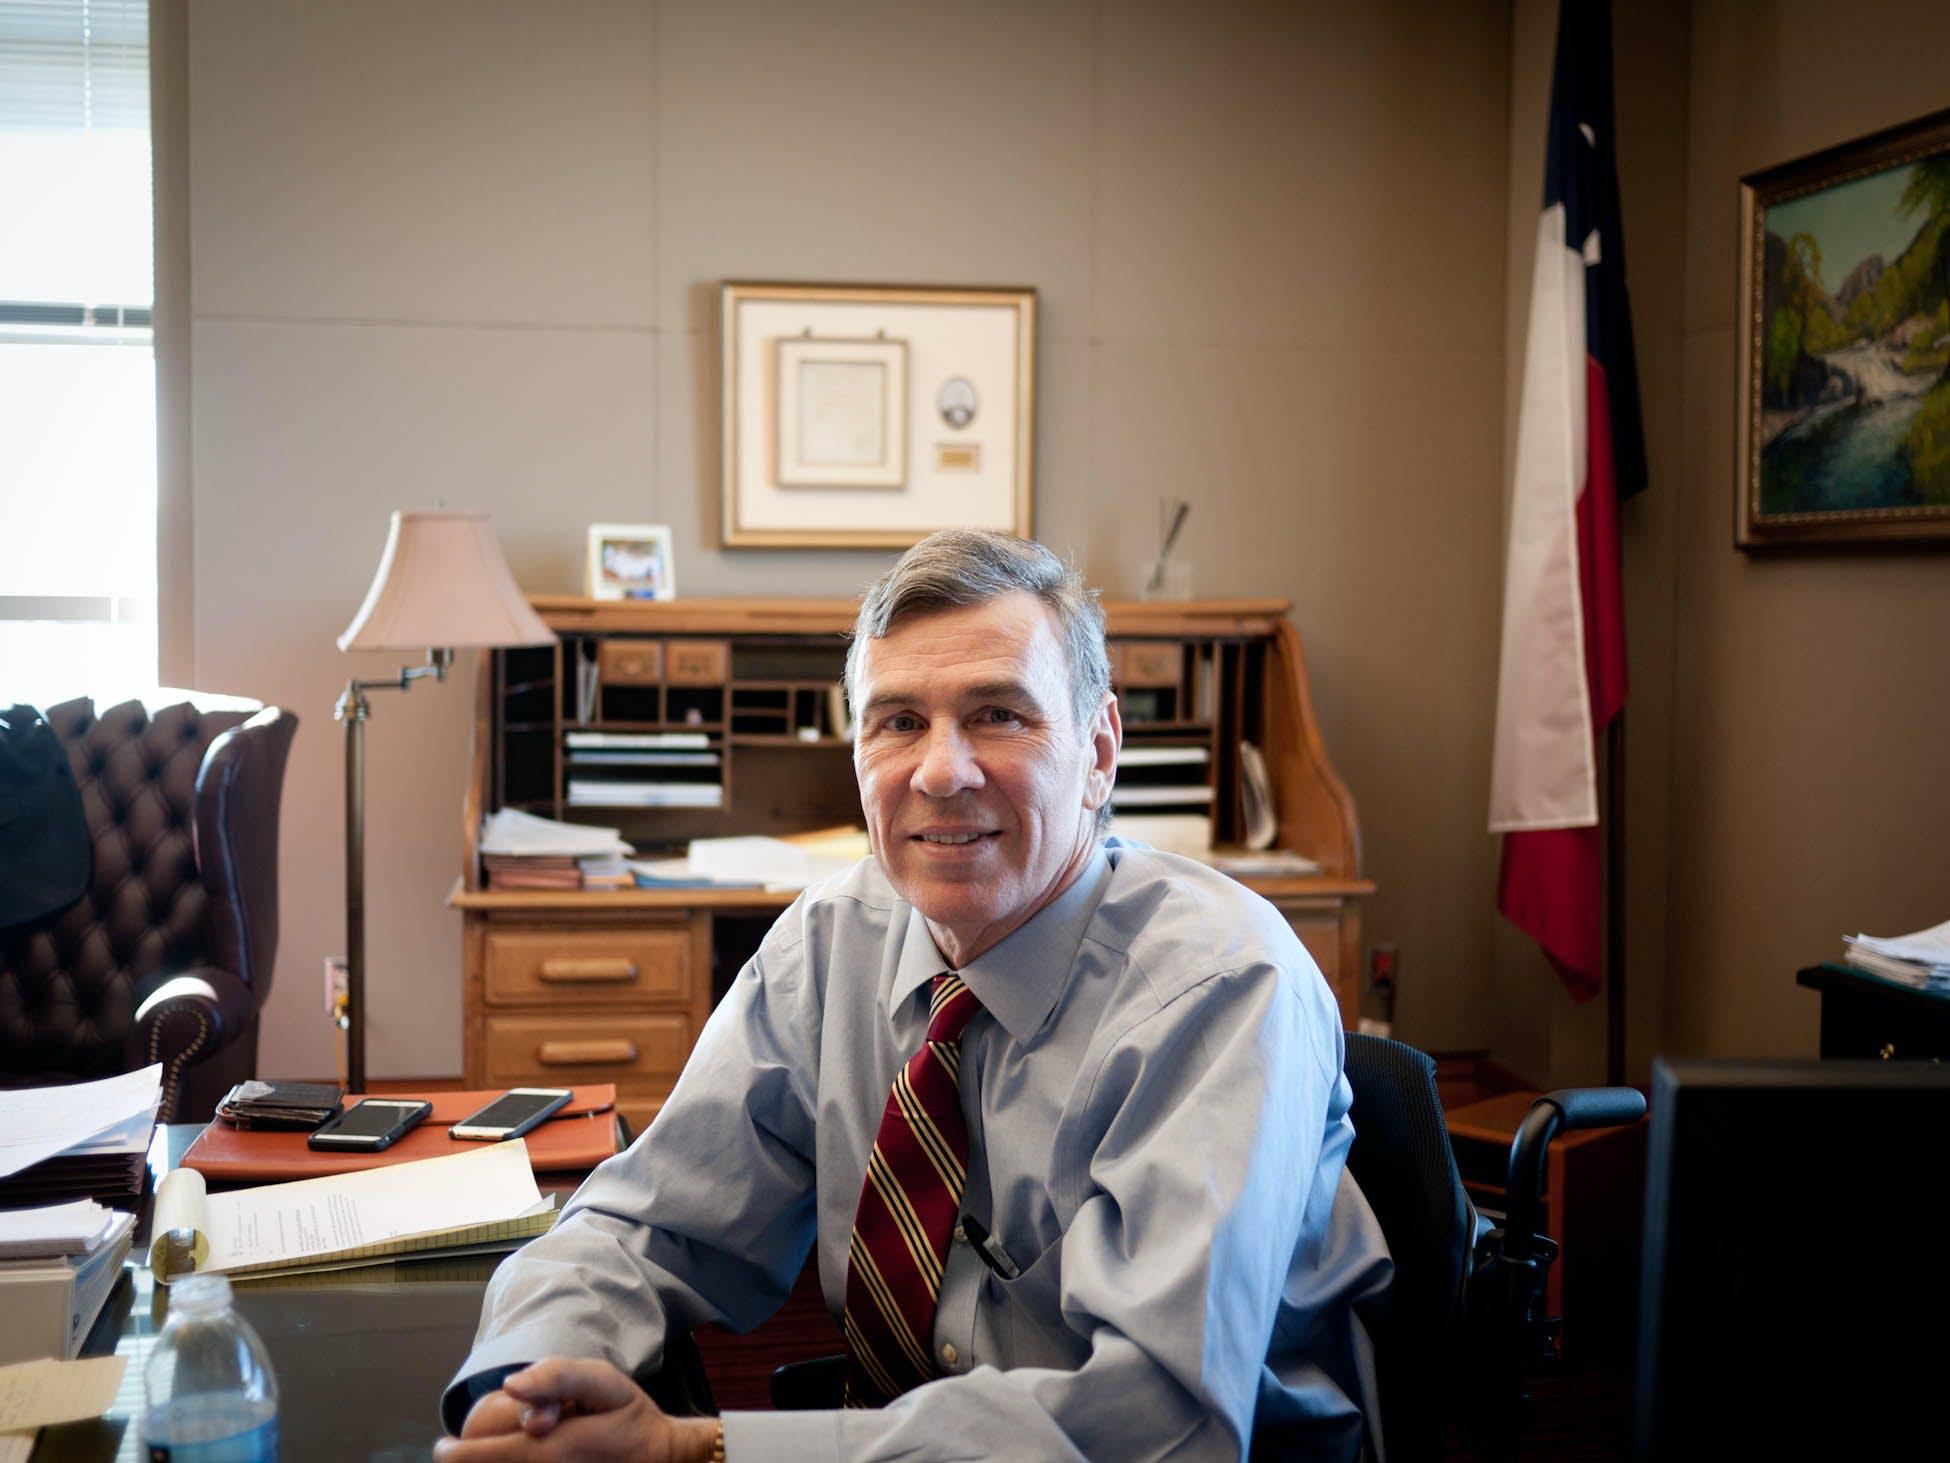 U.S. Magistrate Judge David Fannin